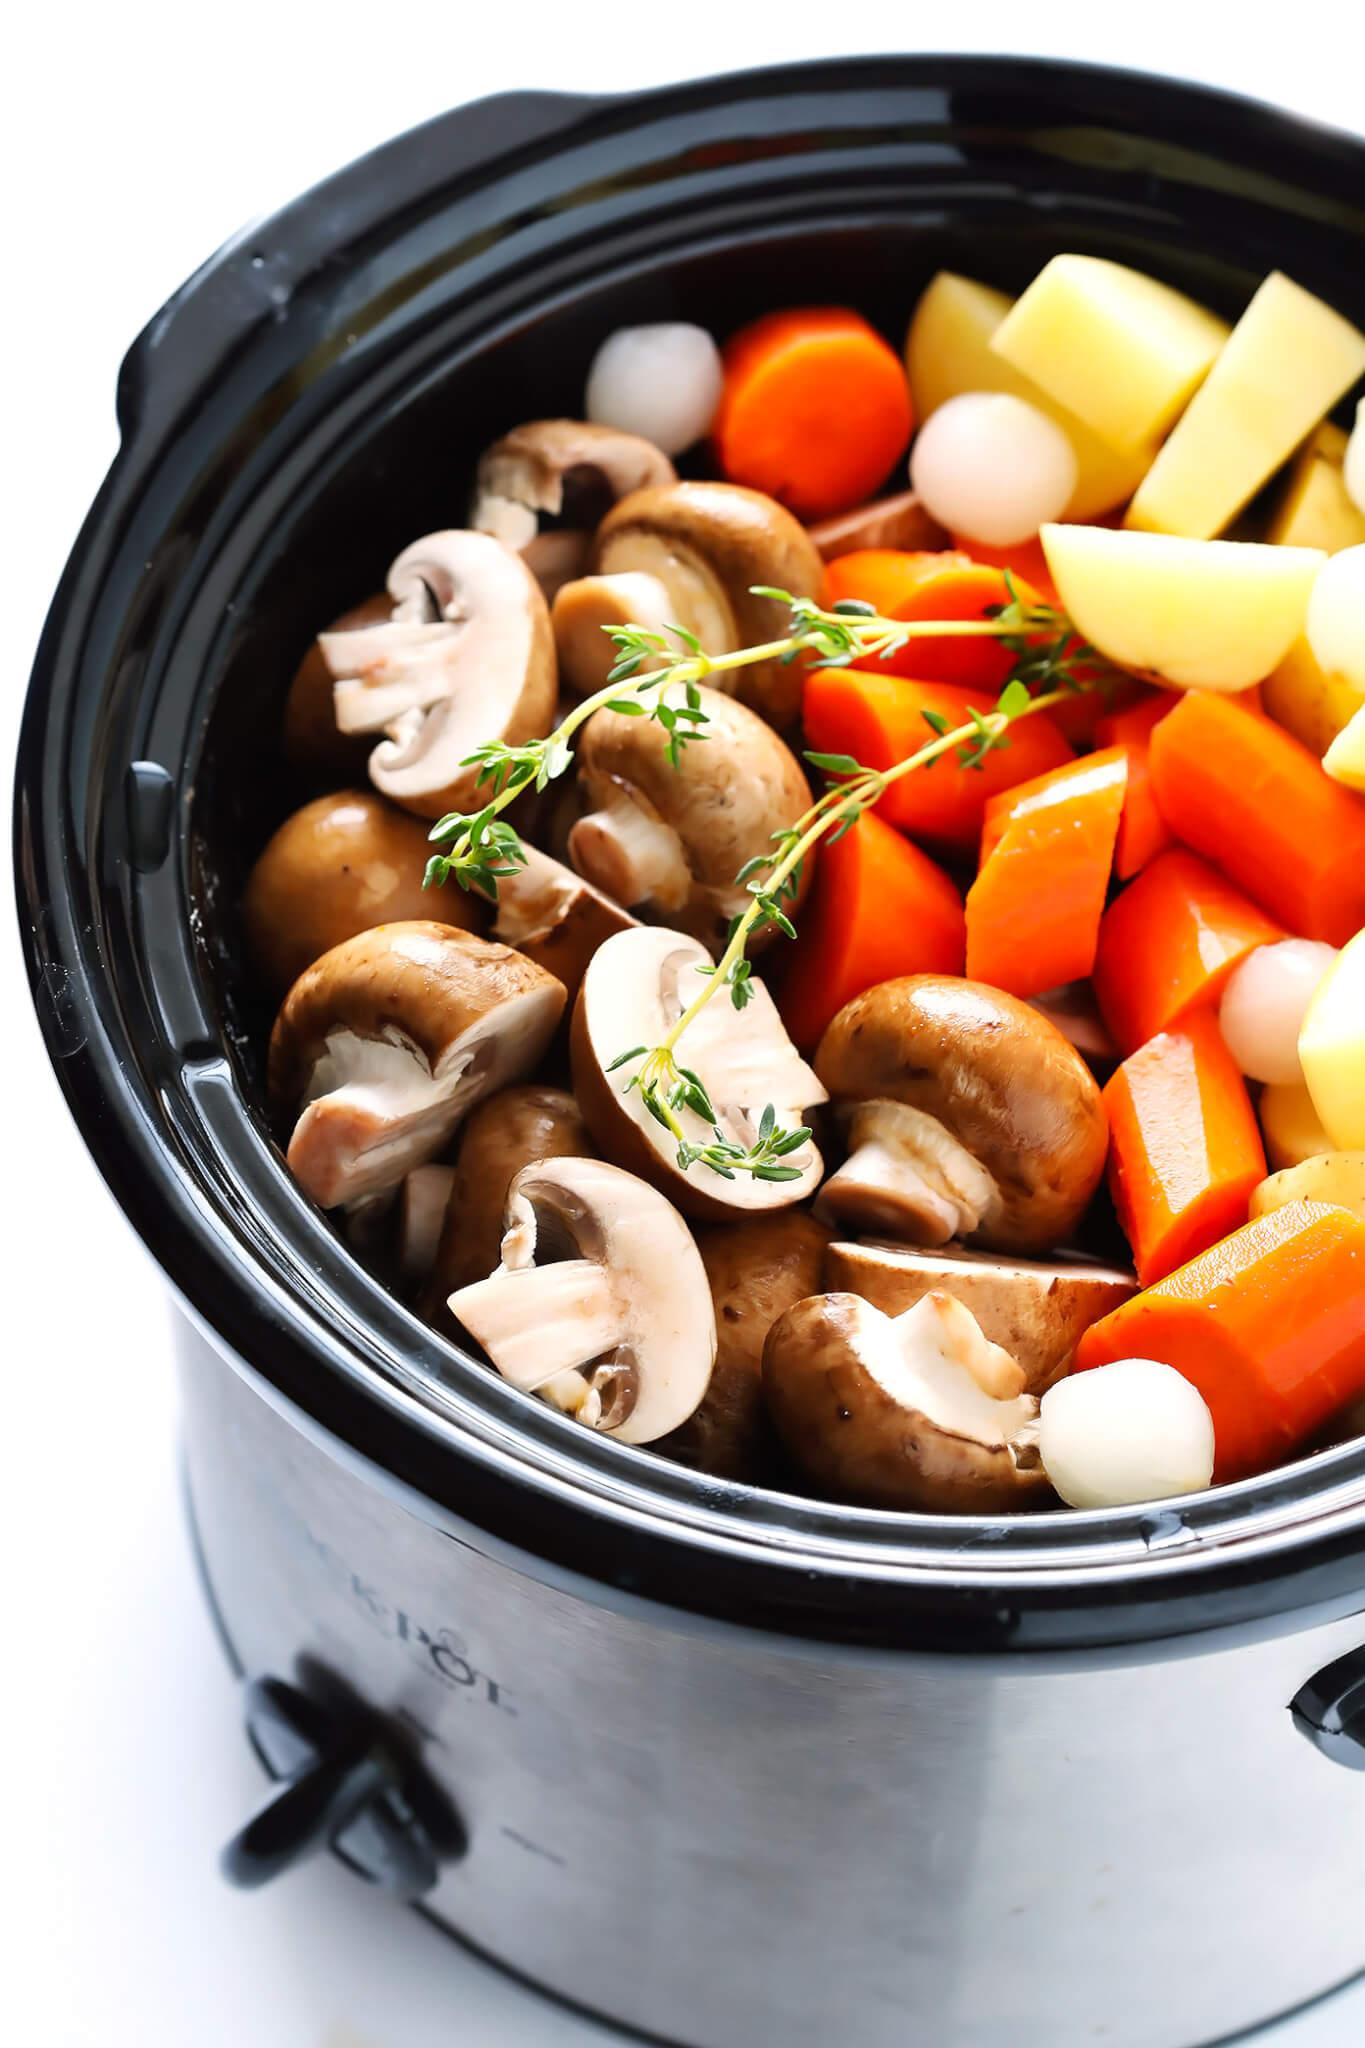 Vegetarian Portobello Pot Roast Recipe Ingredients